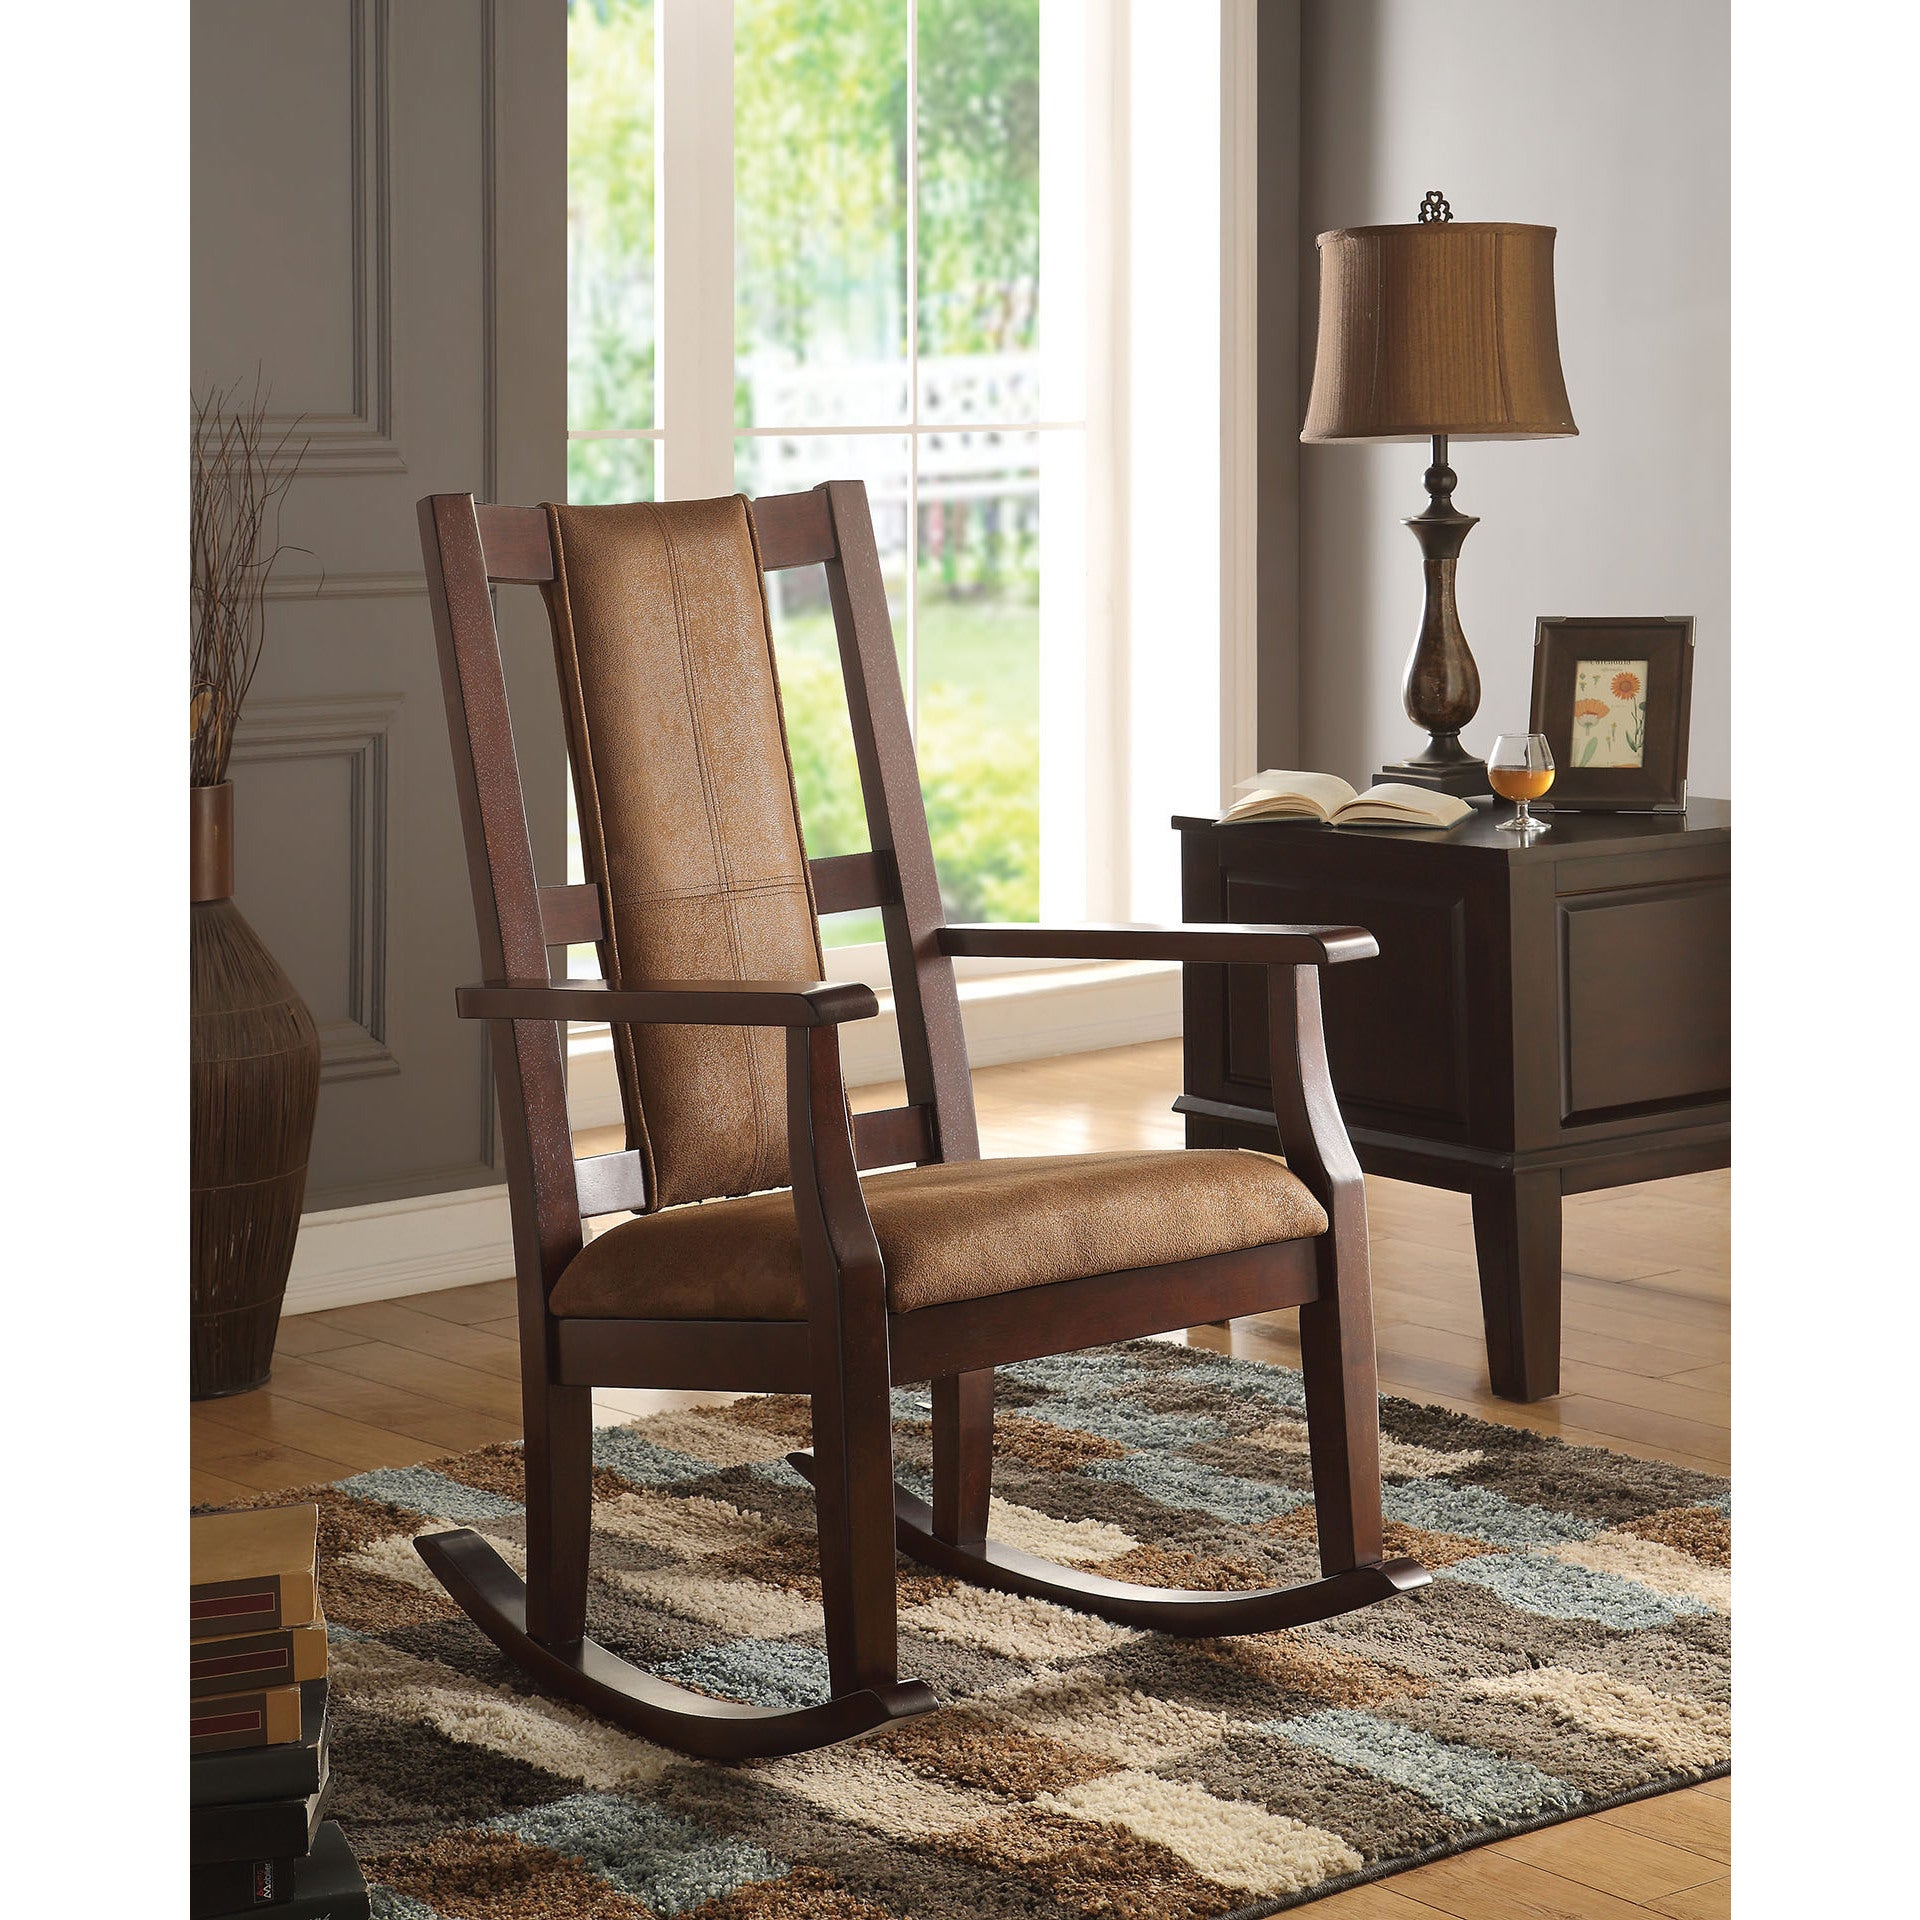 Copper Grove Sanvitalia Espresso Brown Rocking Chair With Regard To Poppy Mission Espresso Rocking Chairs (#3 of 20)